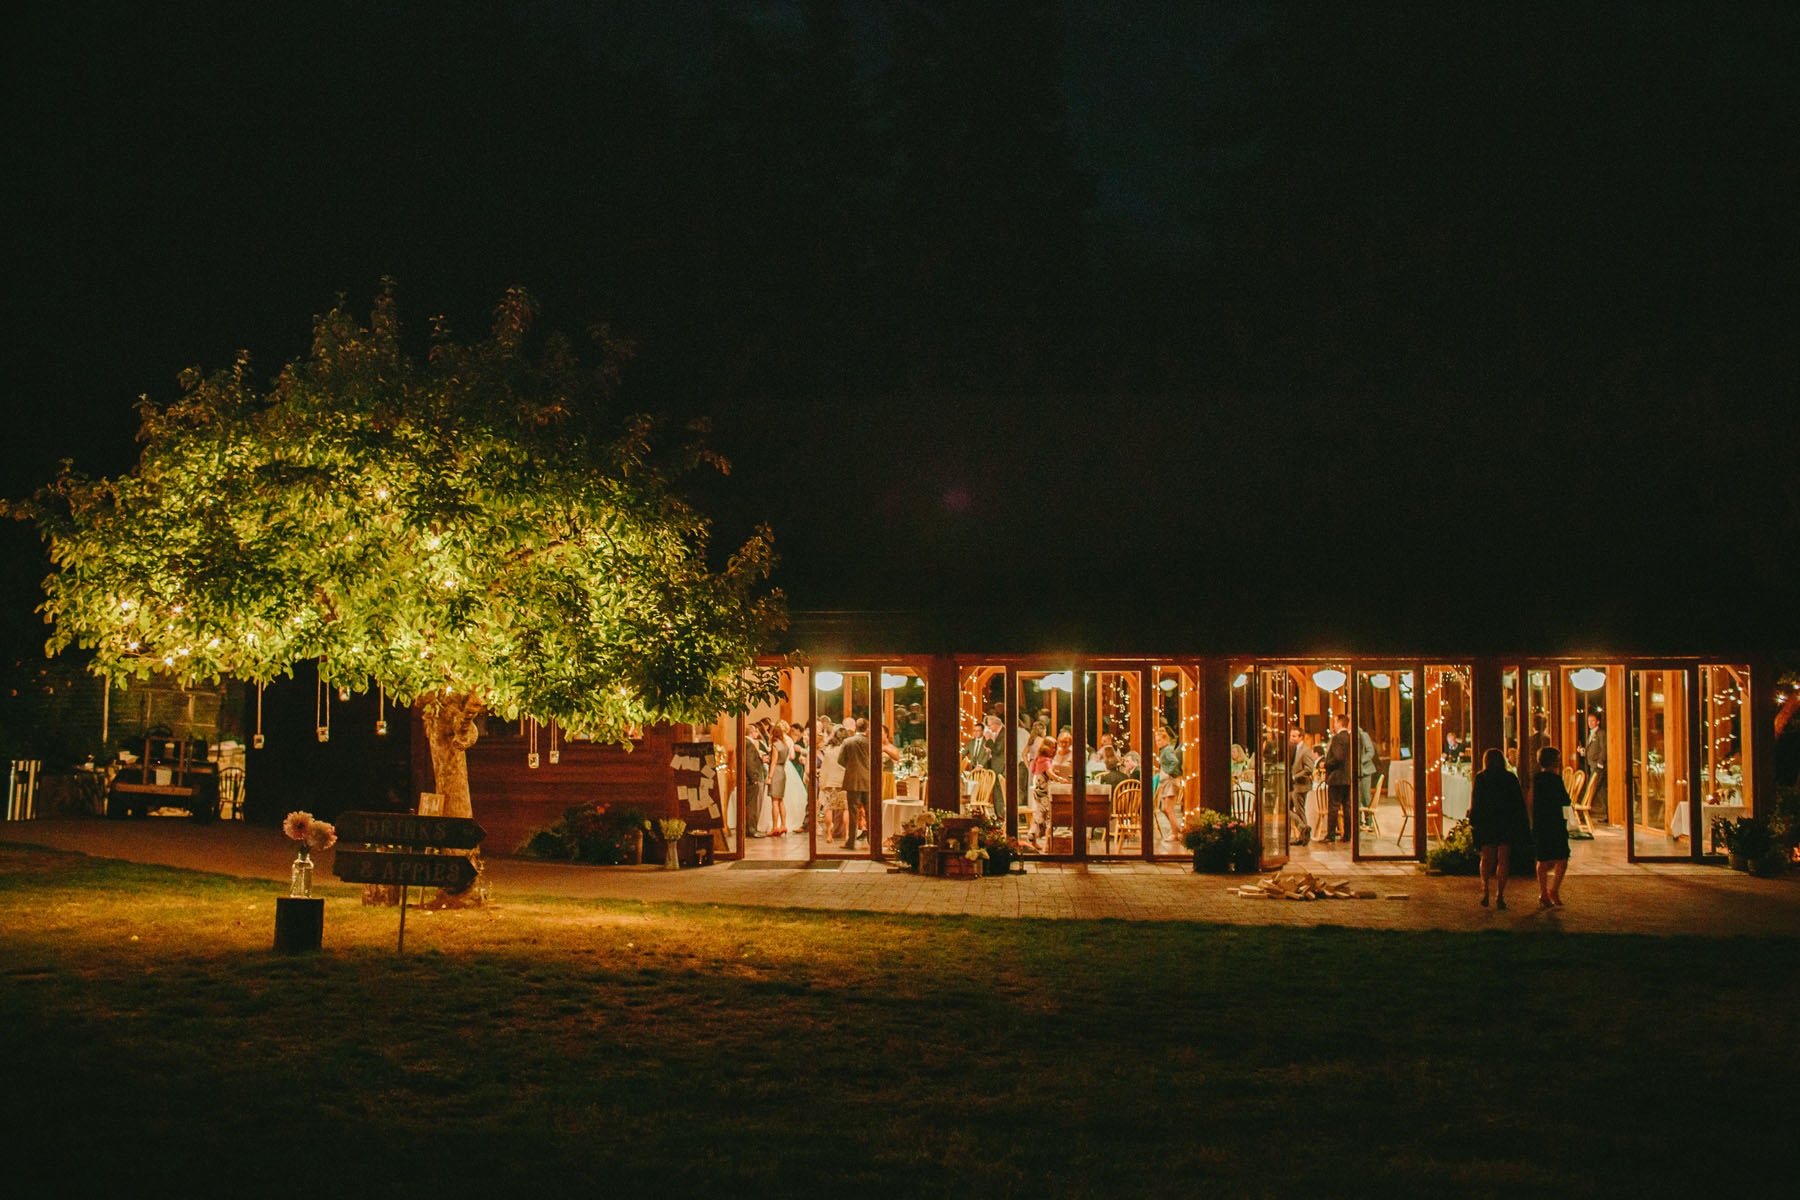 thetis-island-wedding-photographer-rp-rn-213.jpg